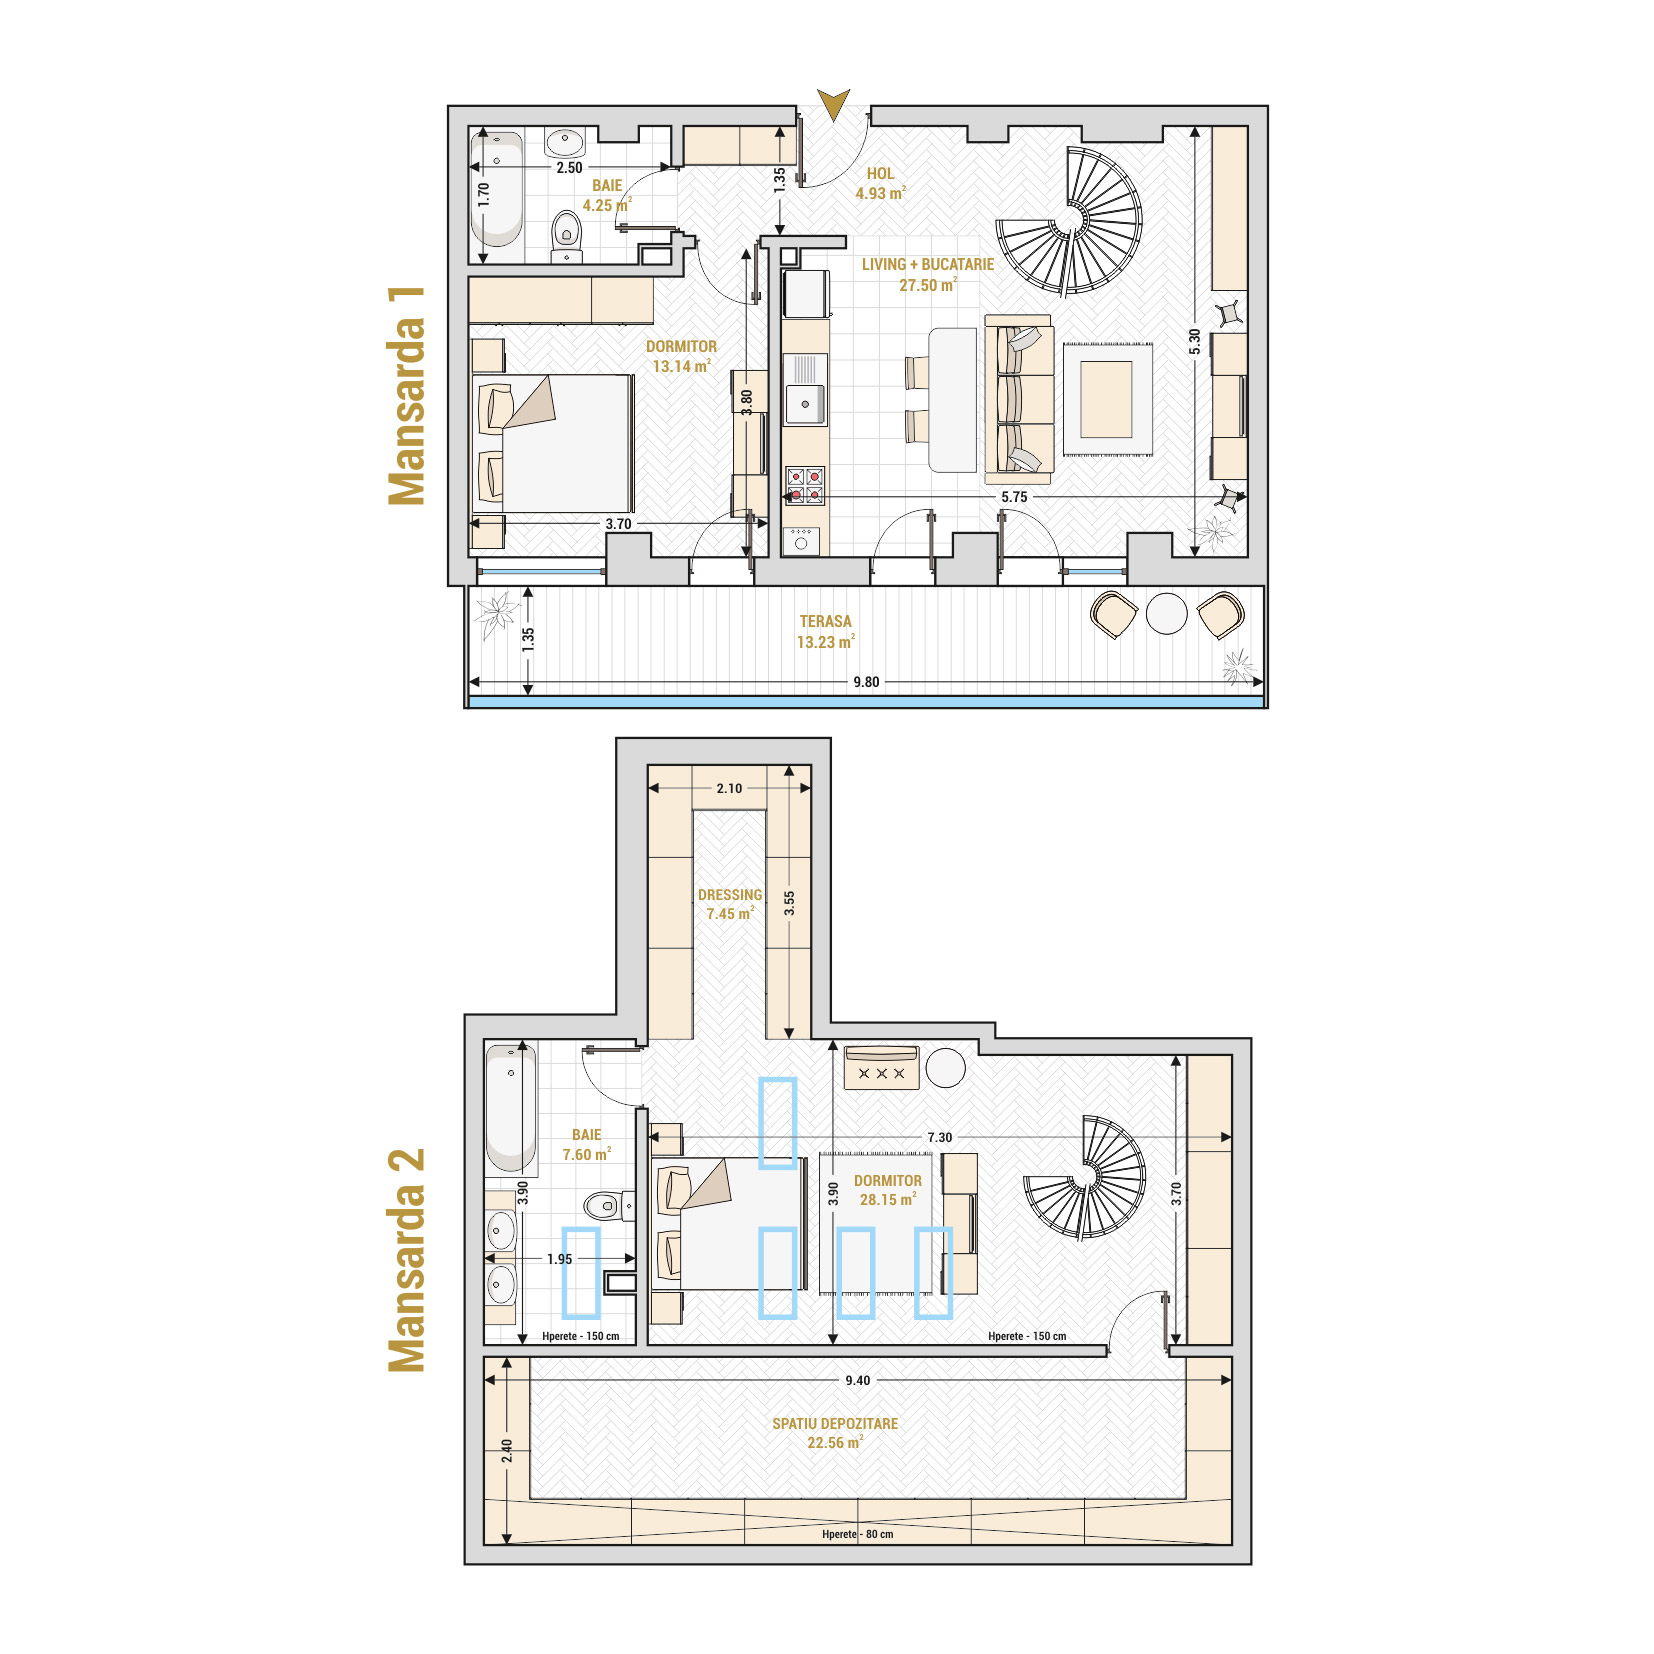 Duplex 3 camere de vanzare Bucuresti - Catedral Residence - Marriott, Piata Unirii, 13 Septembrie, Izvor - T2